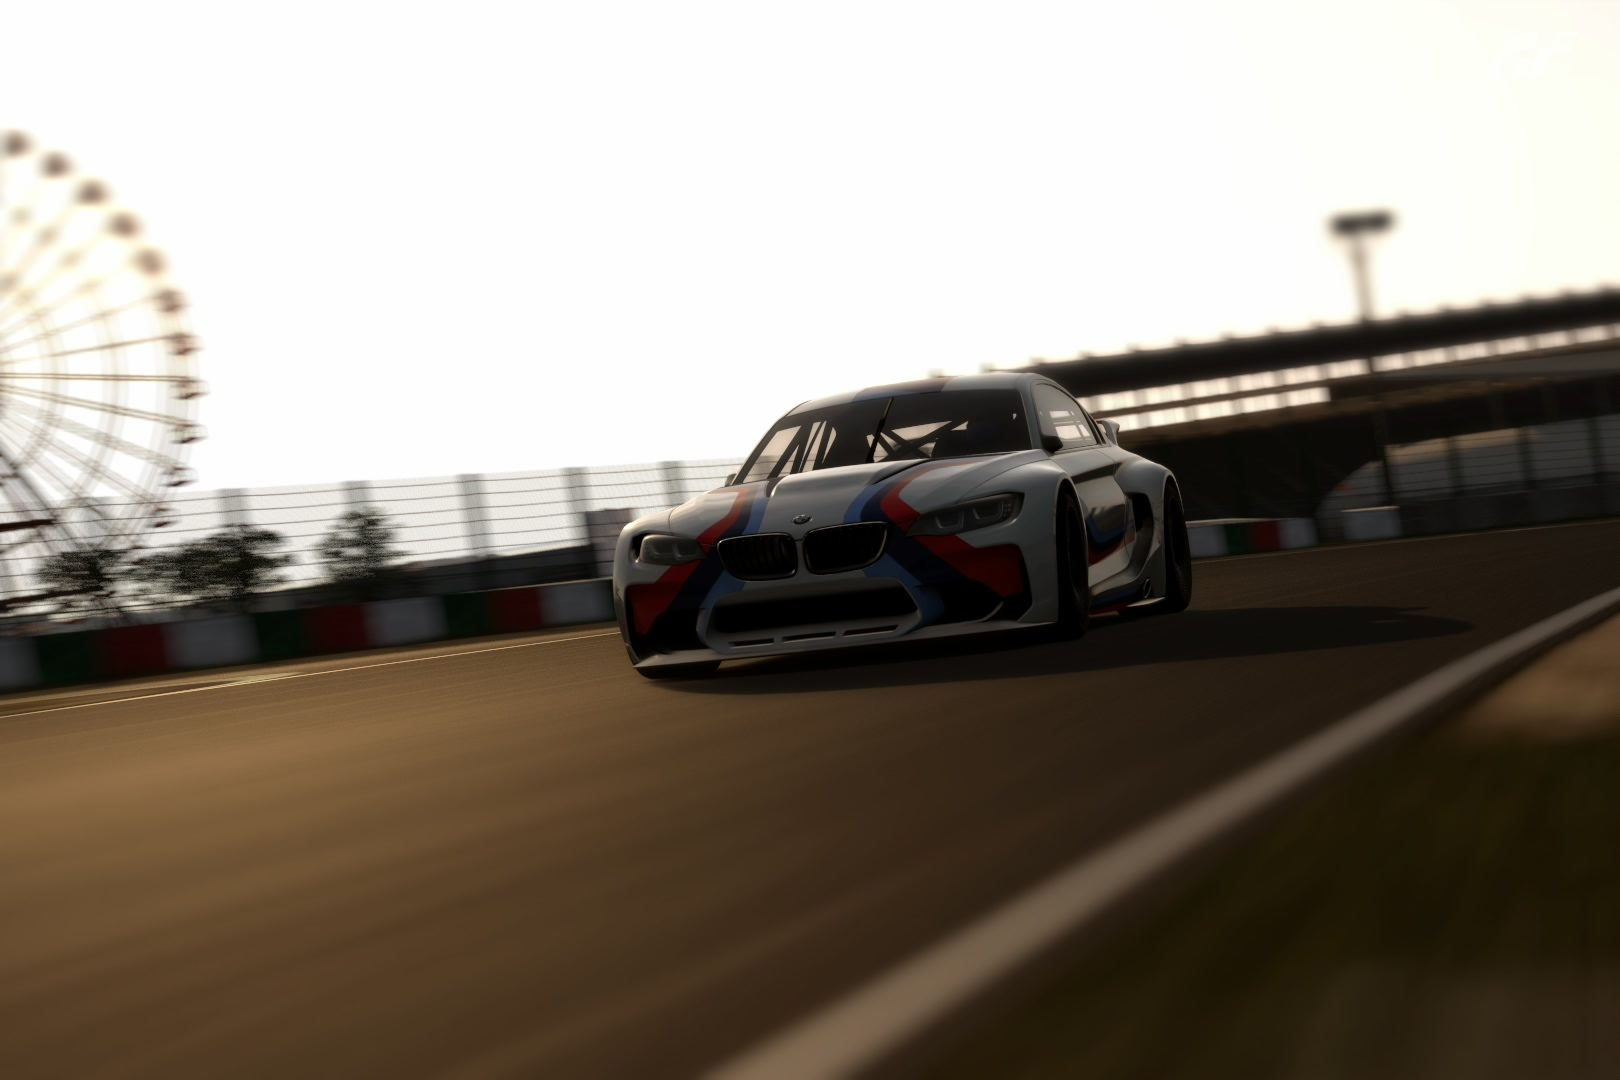 BMW Vision Gran Turismo (Car).jpg